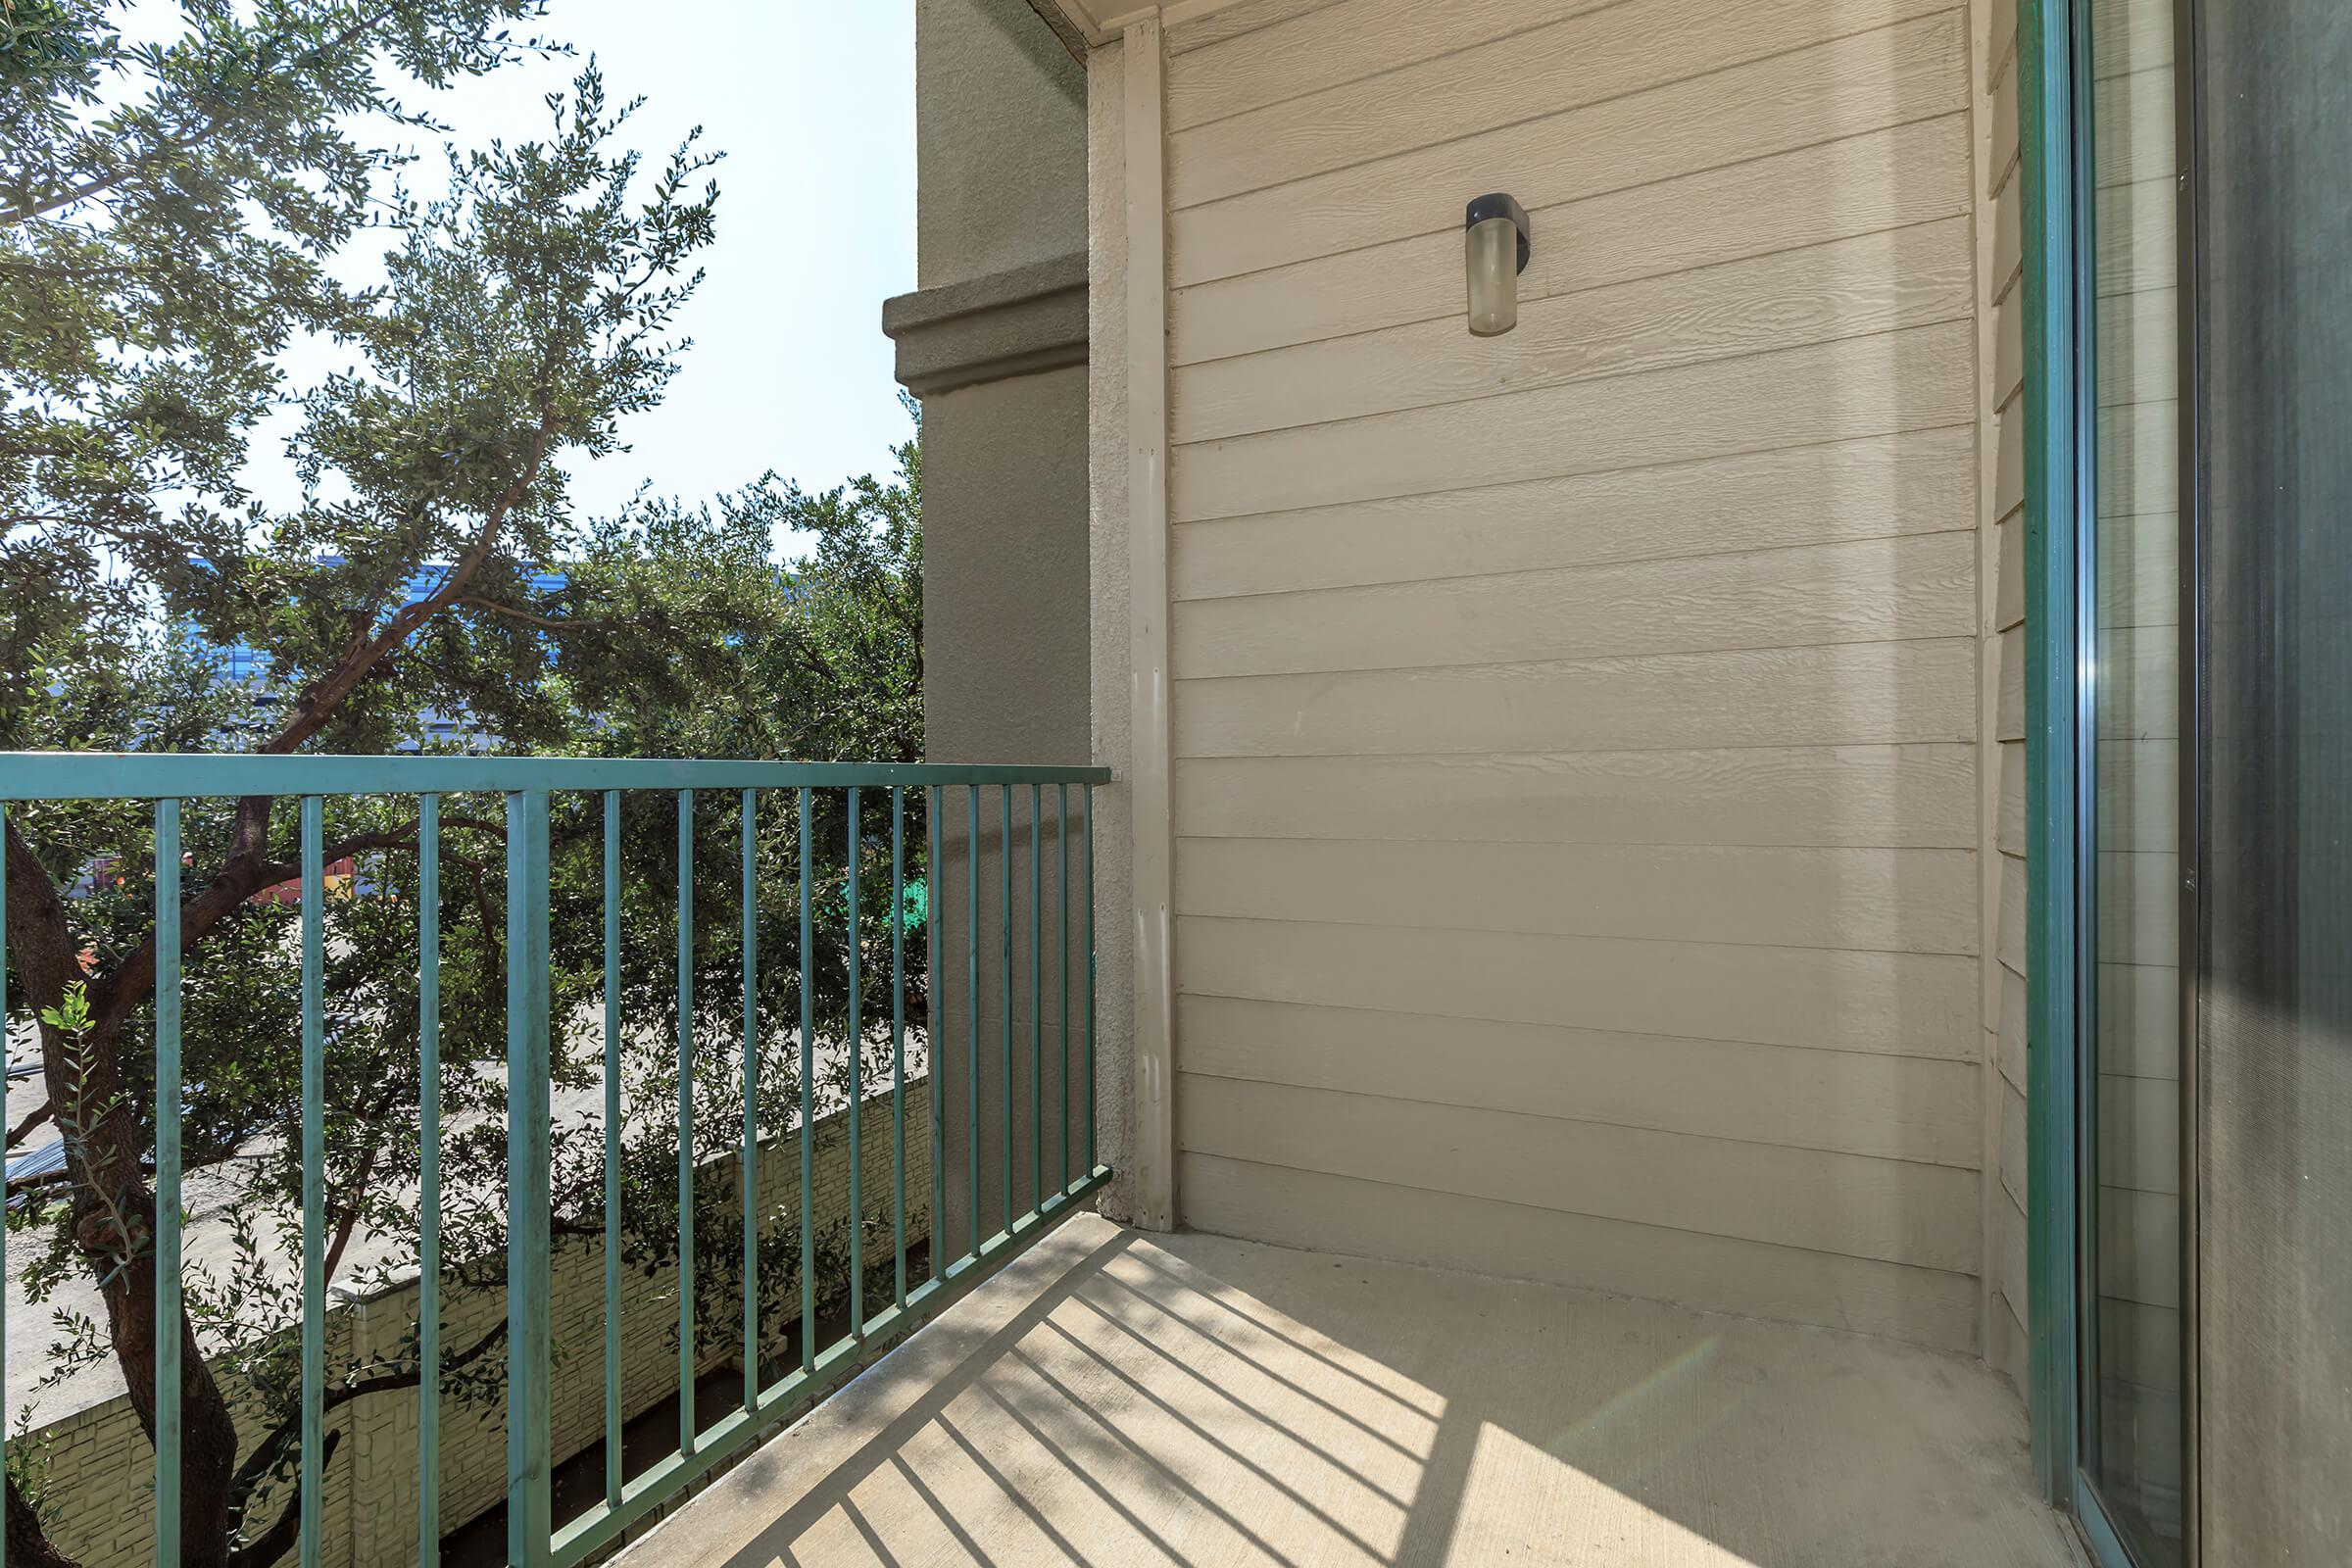 a gate in front of a door